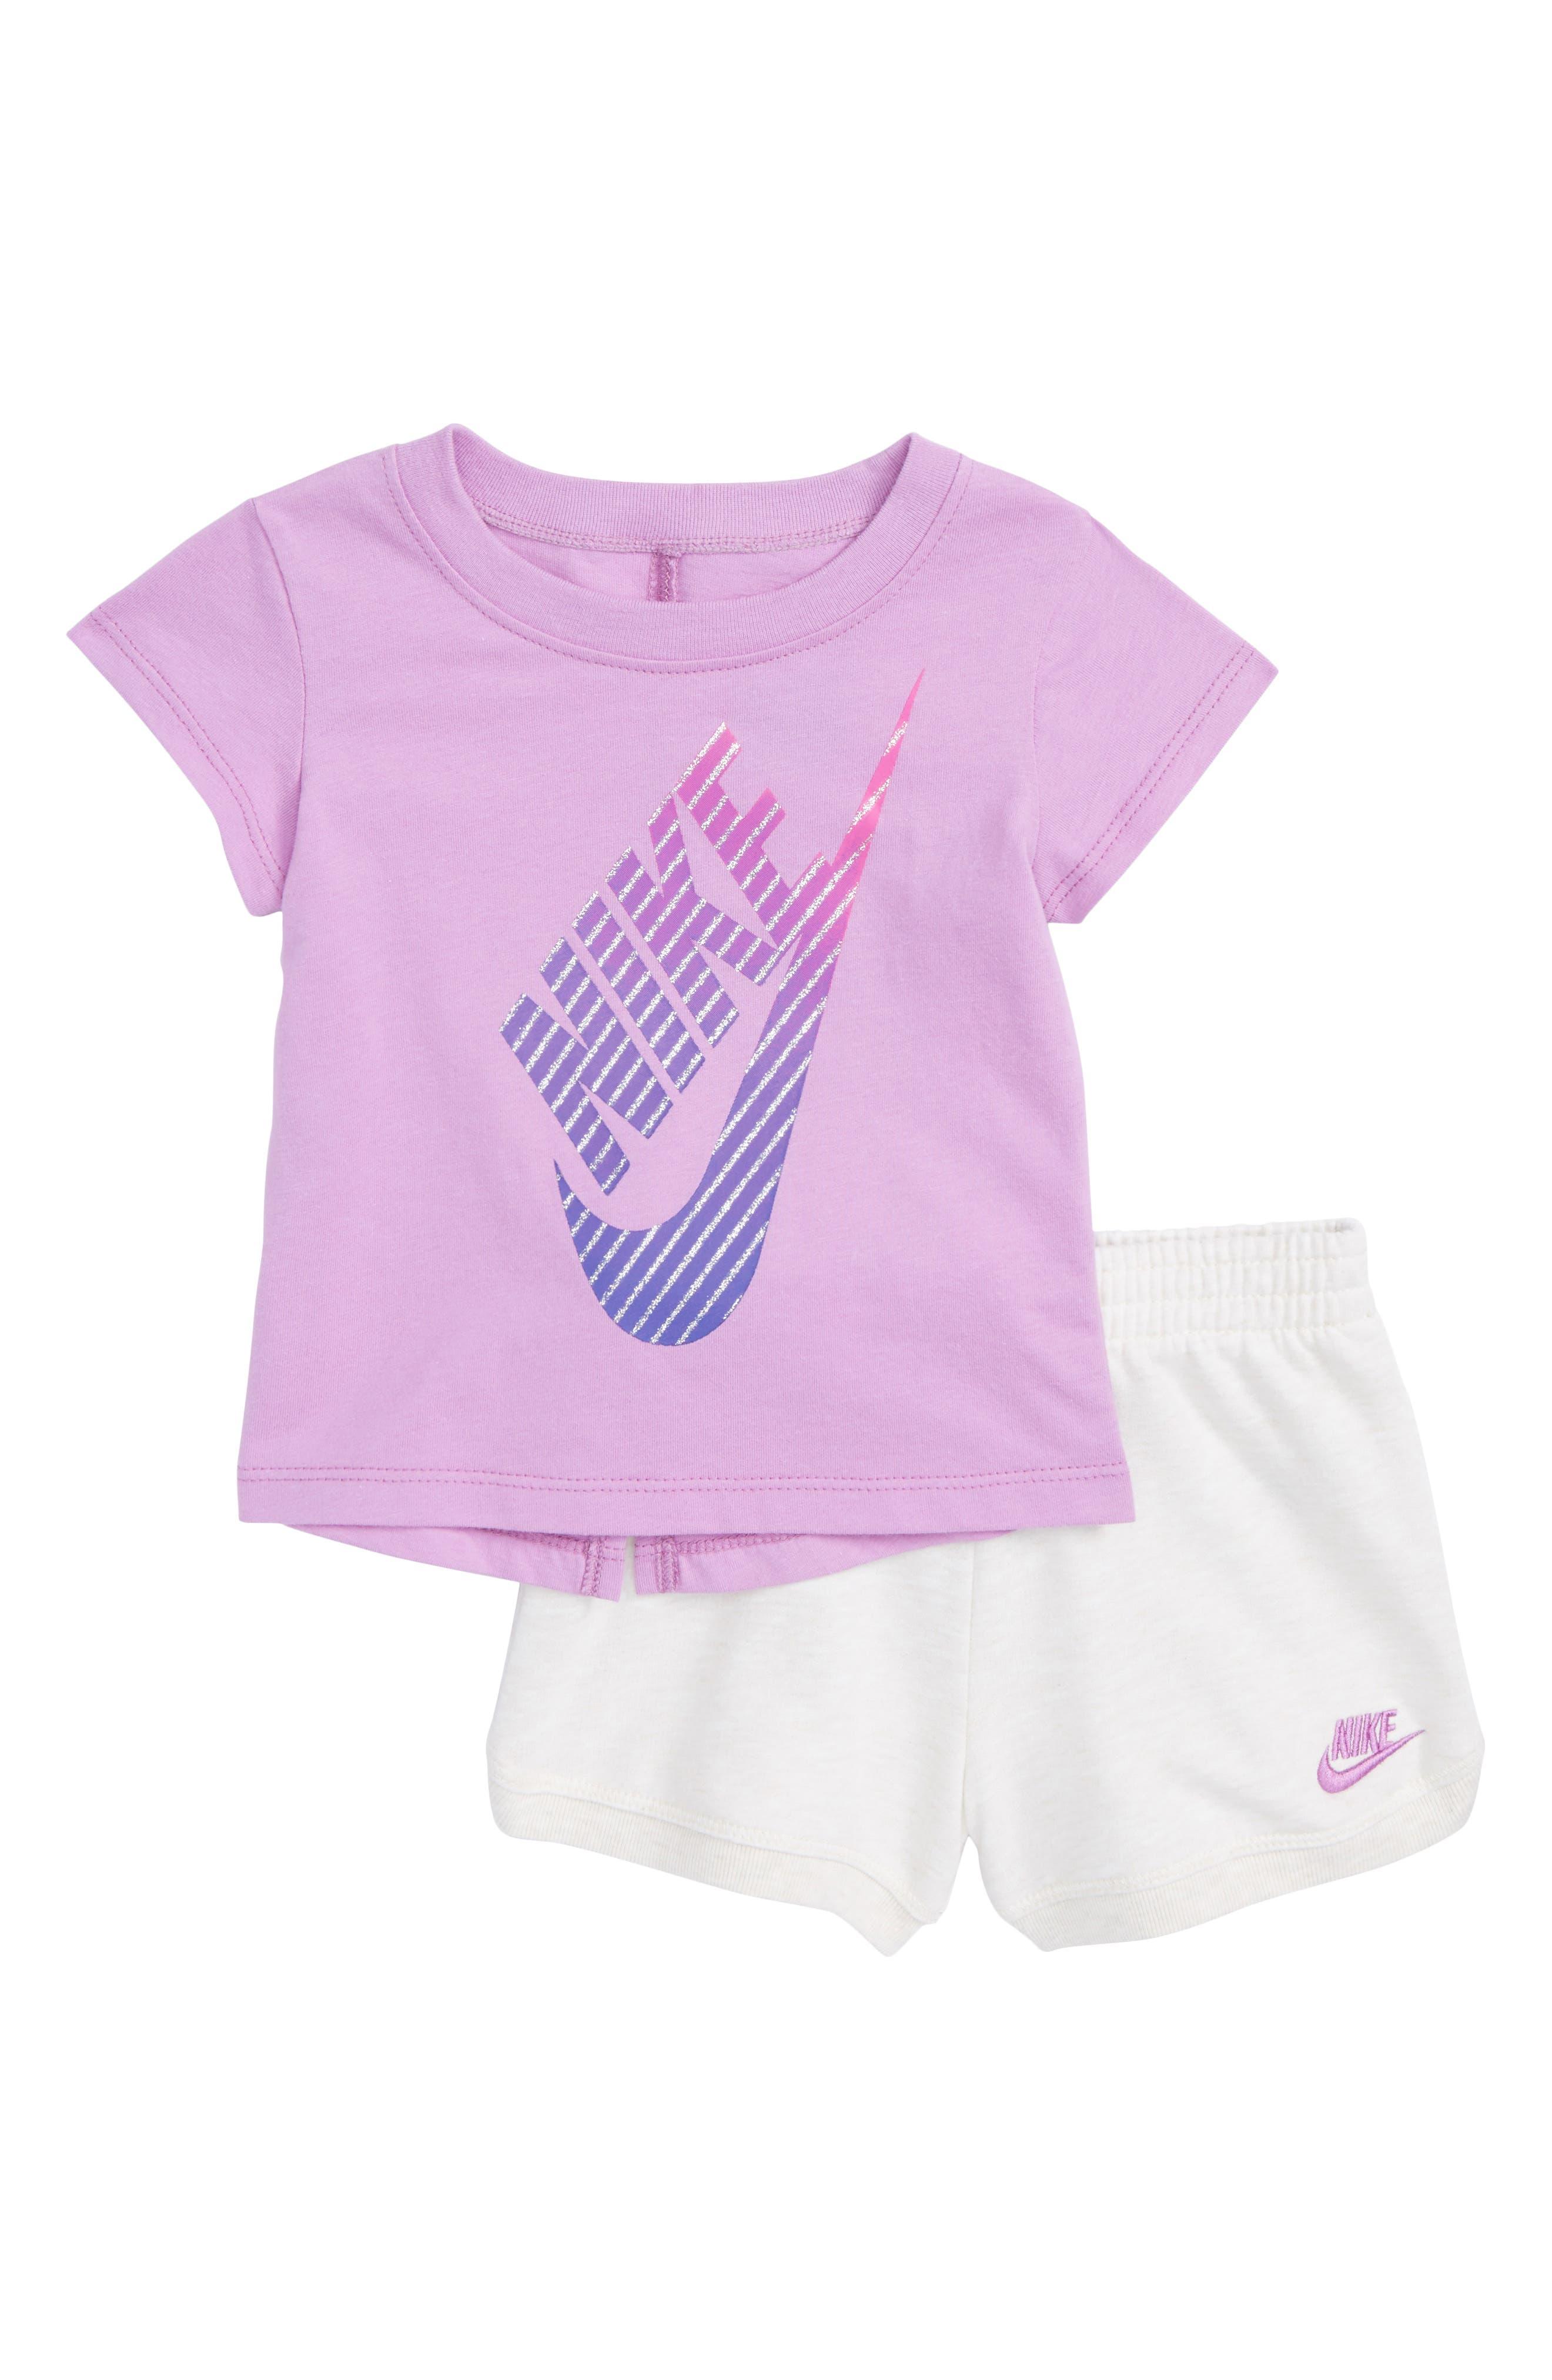 Alternate Image 1 Selected - Nike Gradient Futura Tee & Shorts Set (Baby Girls)